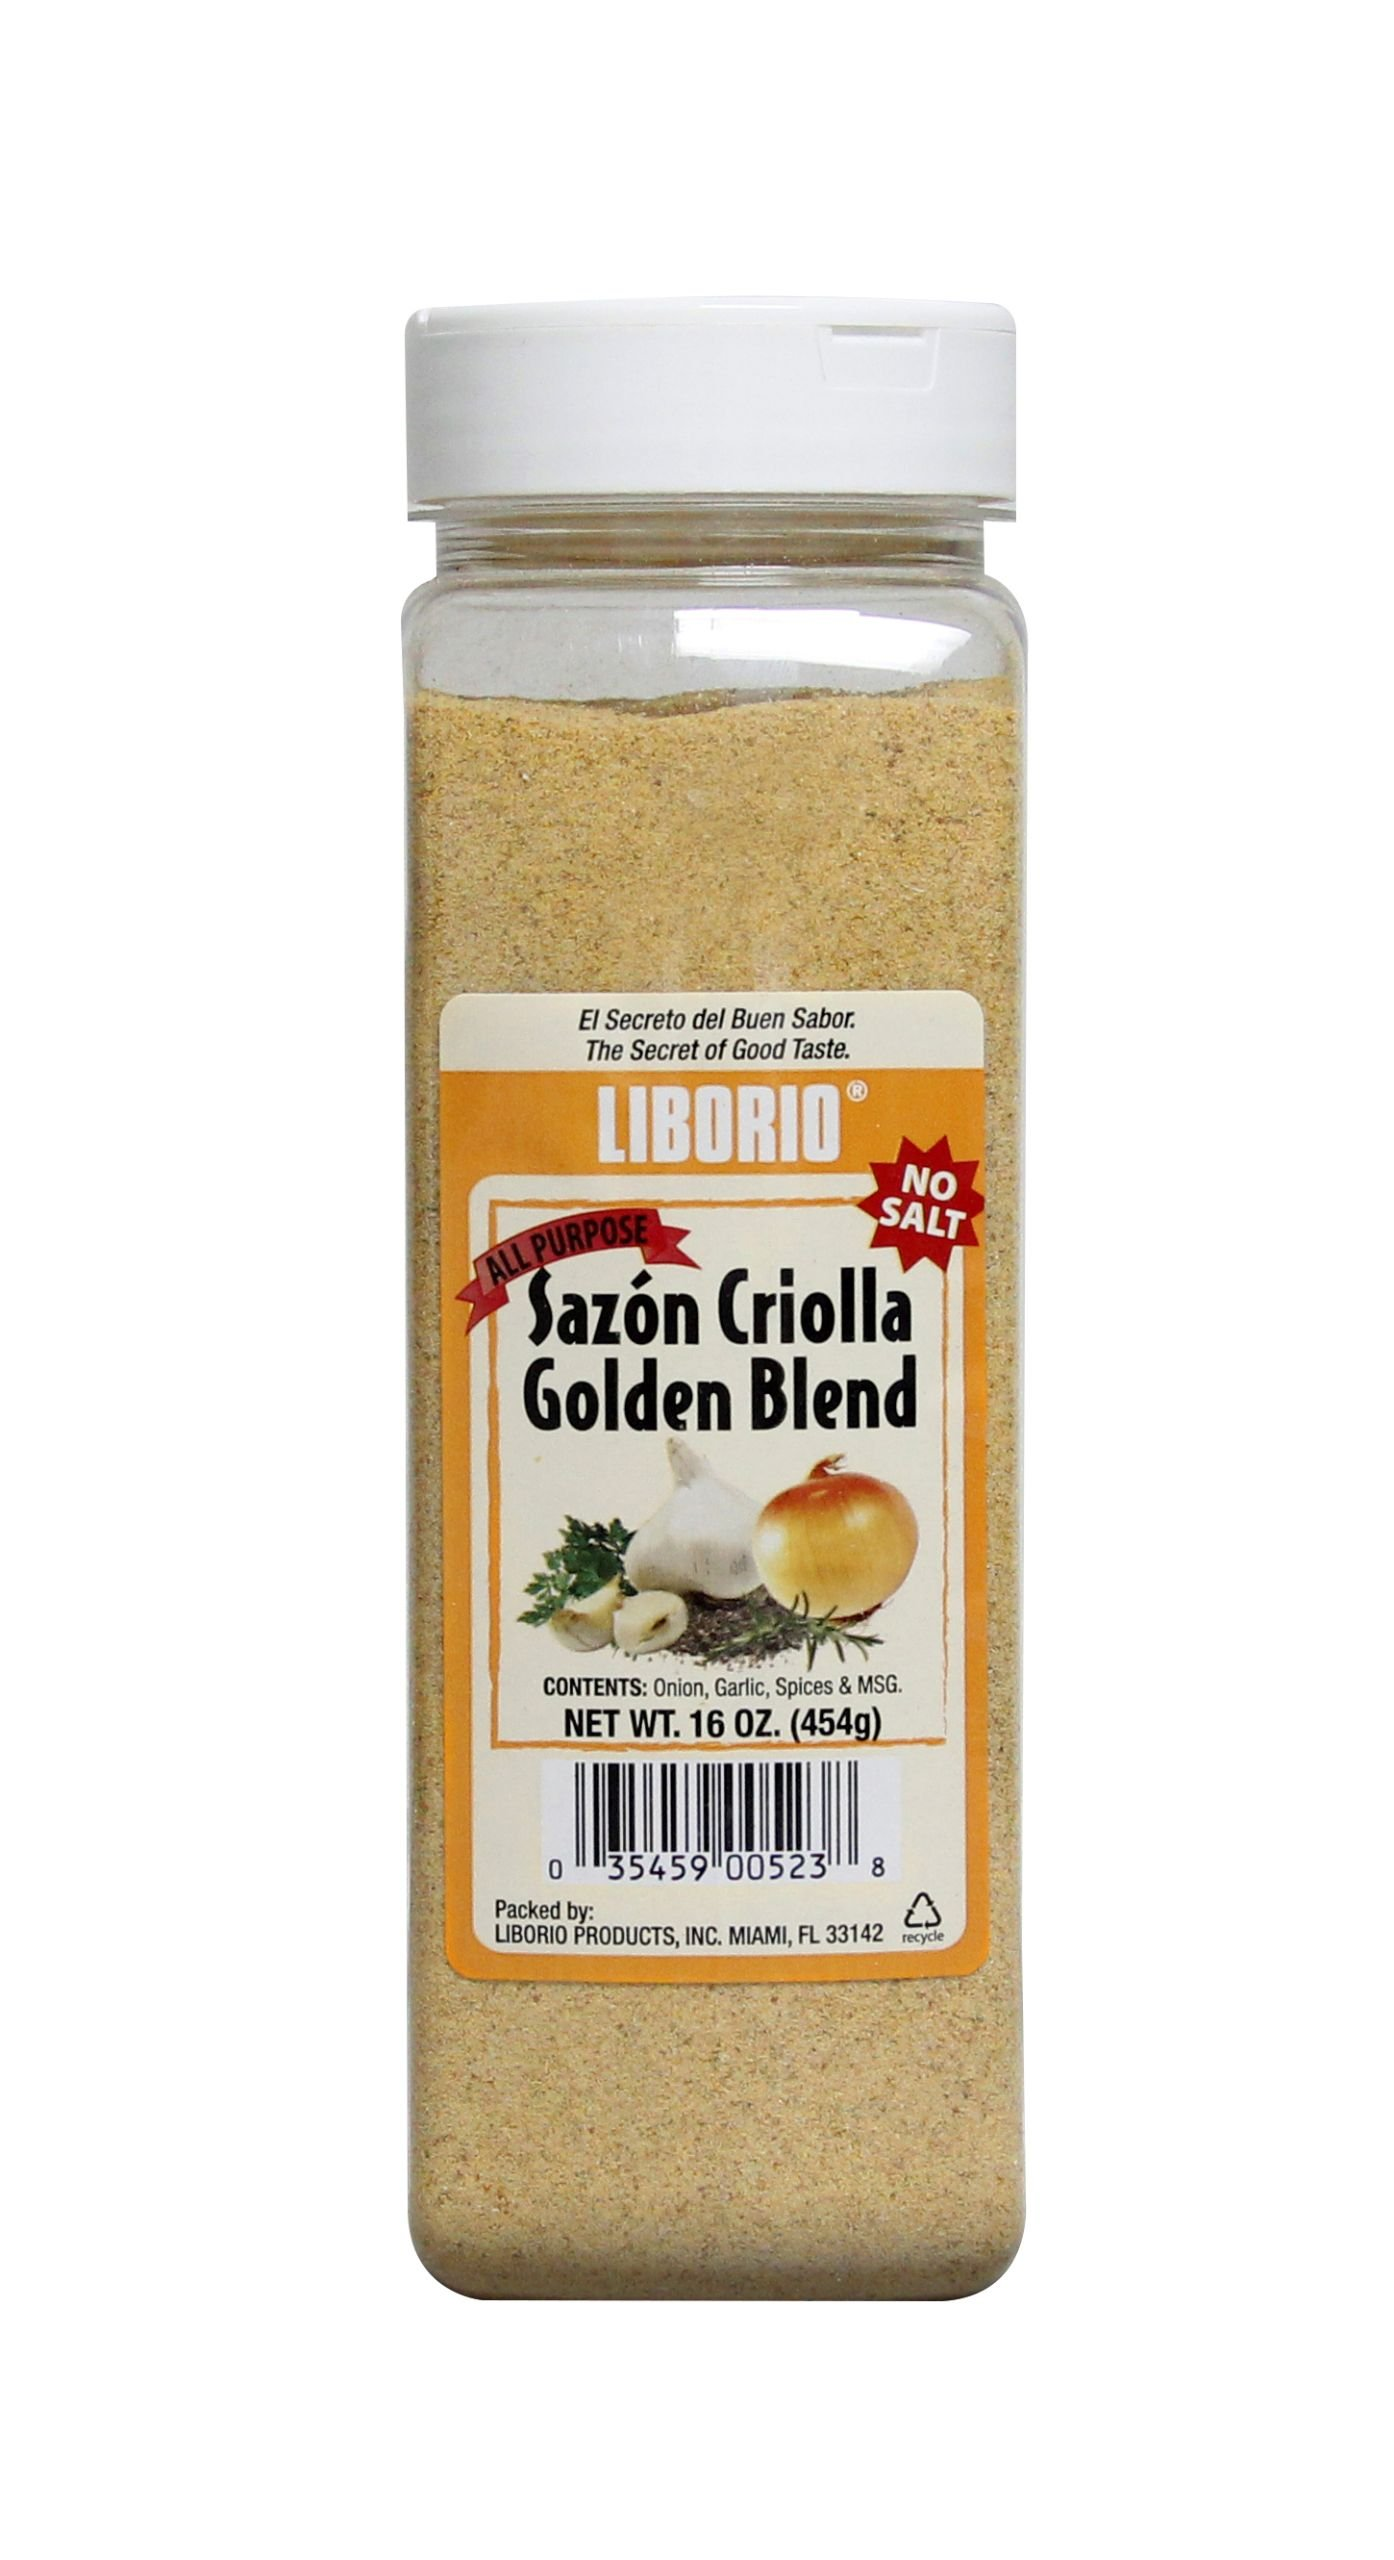 Liborio Sazón Gold All Purpose Seasoning, 16oz